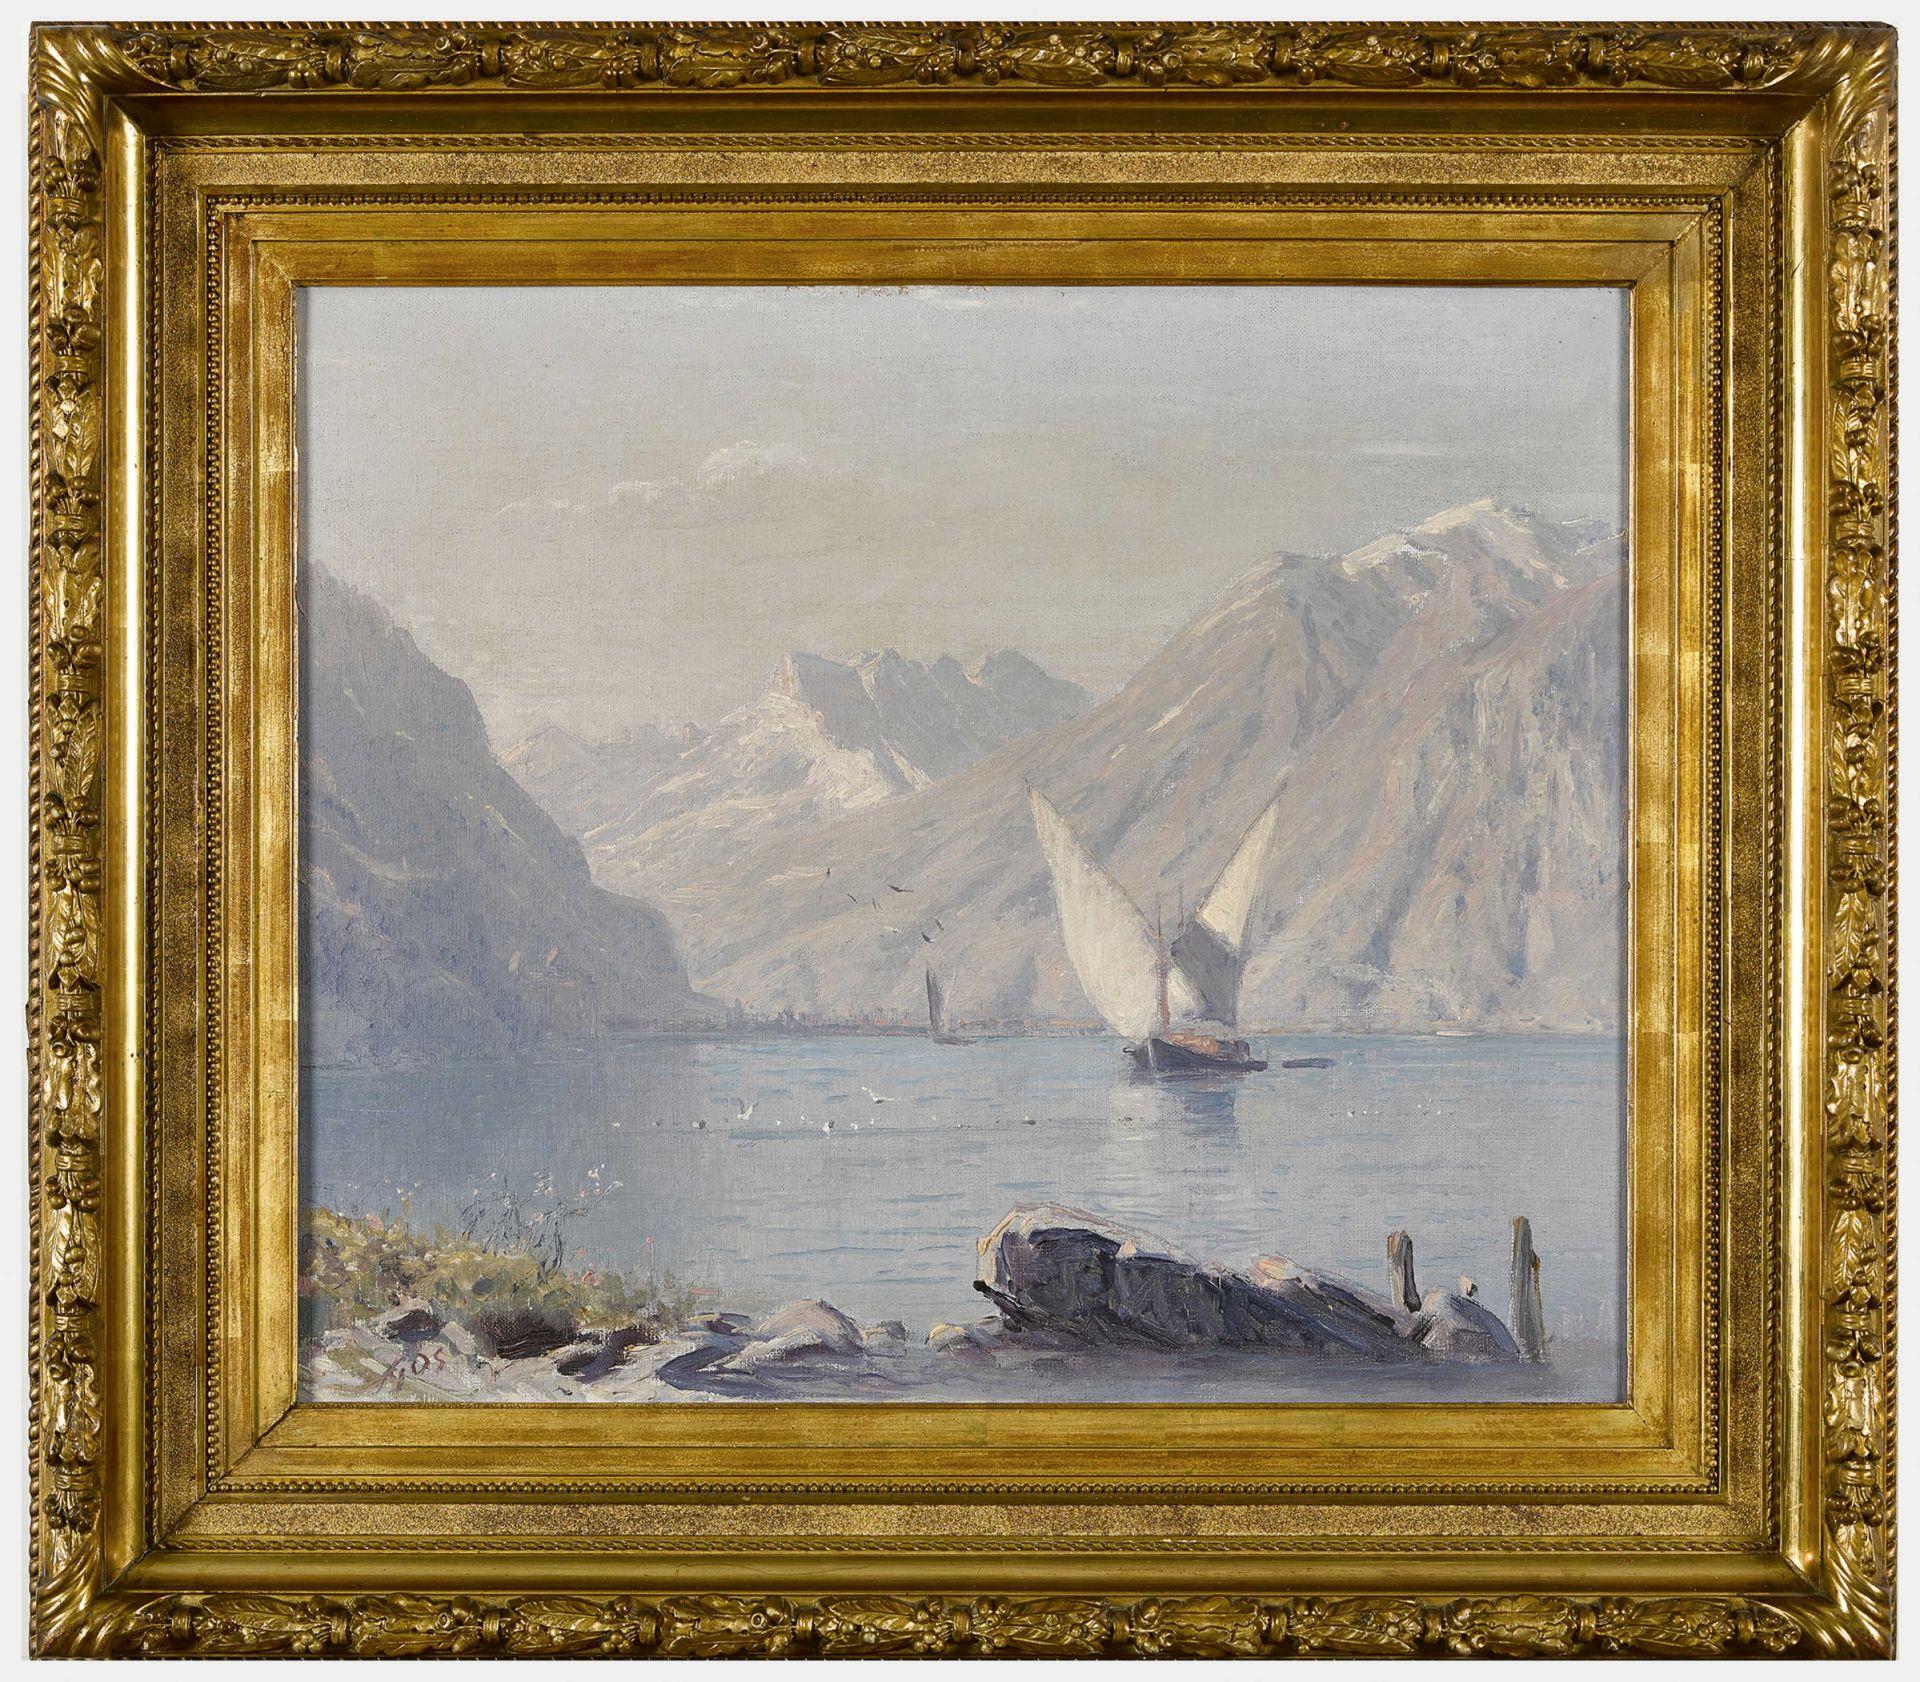 GOS, ALBERT HENRY JOHN: Lac Léman et Dents du Midi. - Image 2 of 2